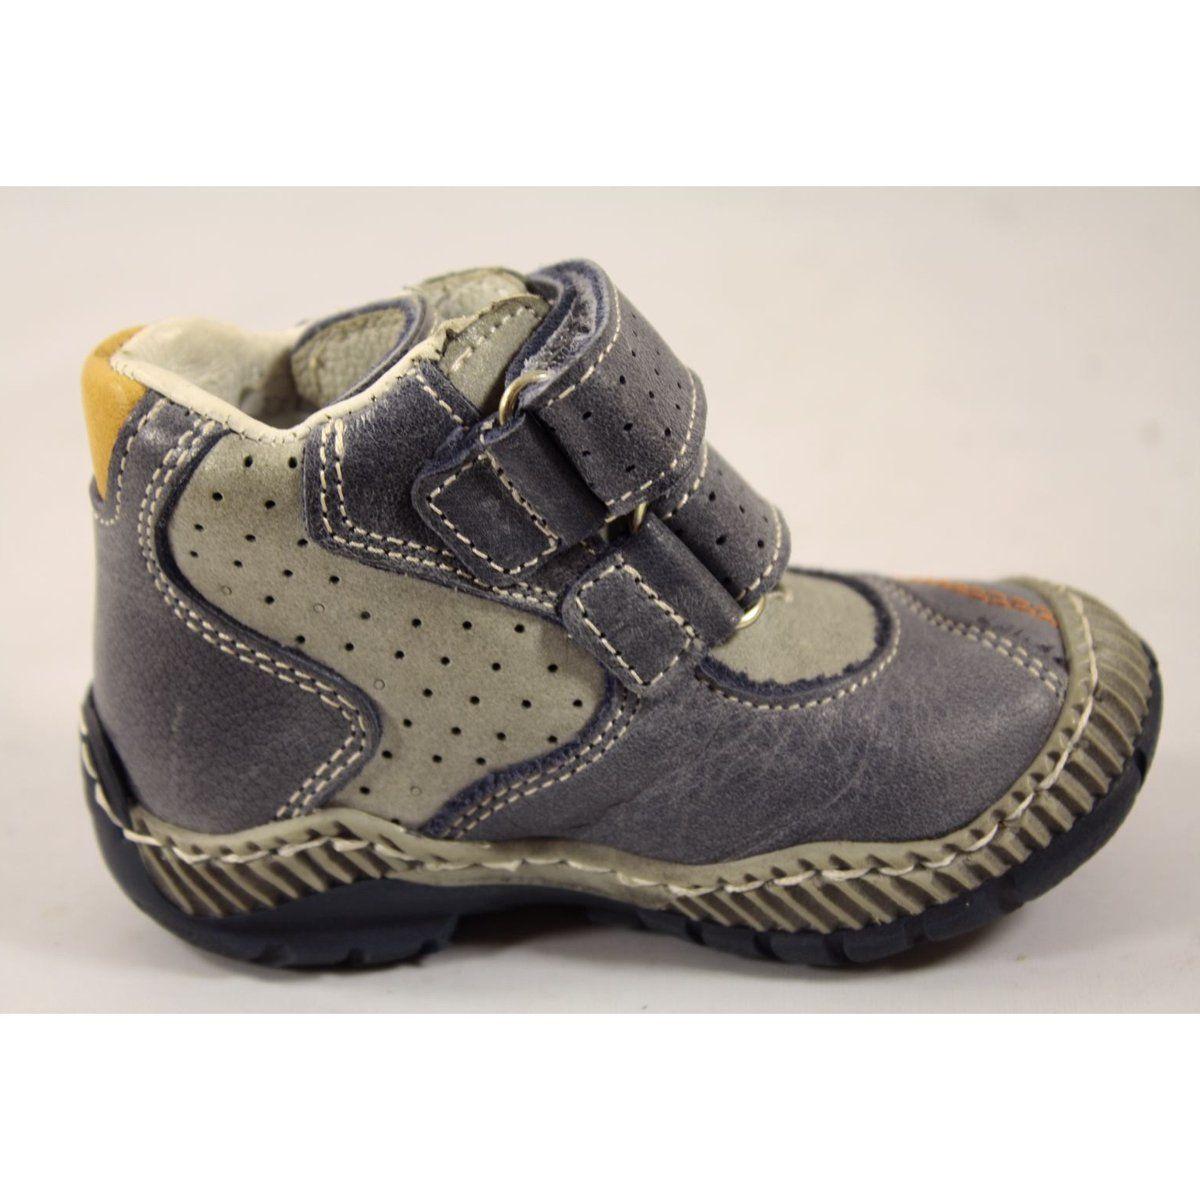 Ren But Trzewiki Ren But Niebieskie Pomaranczowe Szare Childrens Shoes Kid Shoes Boots